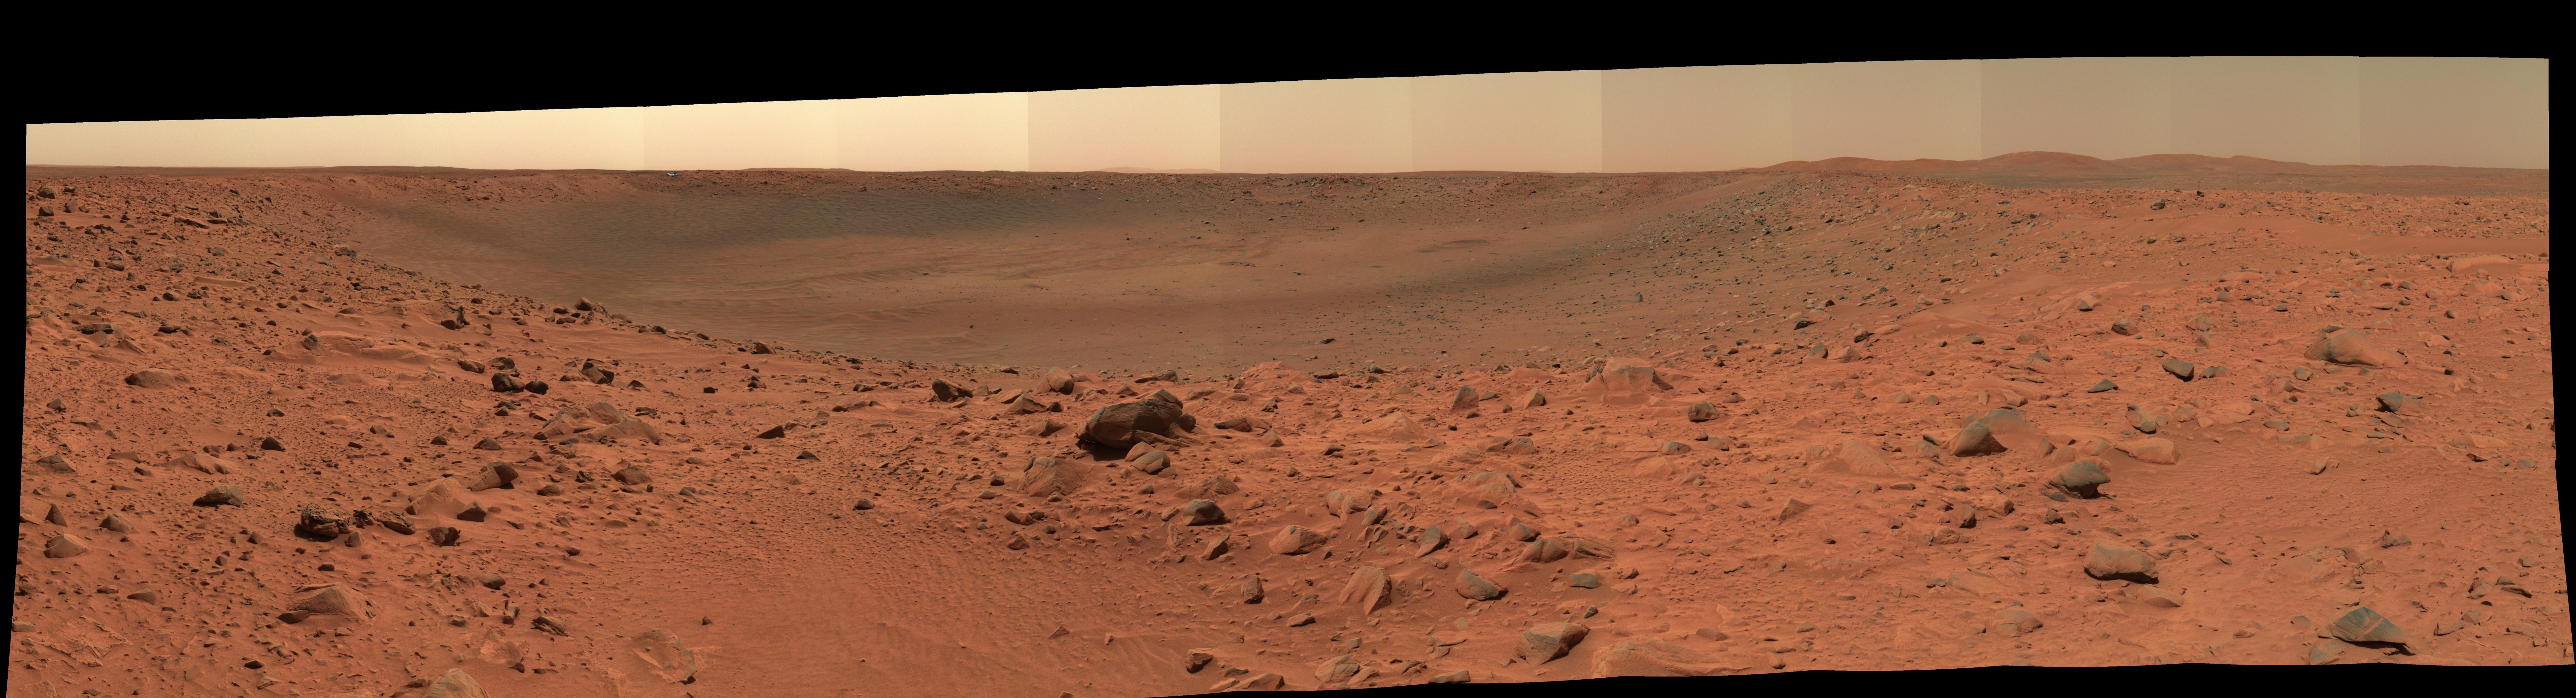 Bonneville Crater, Spirit rover